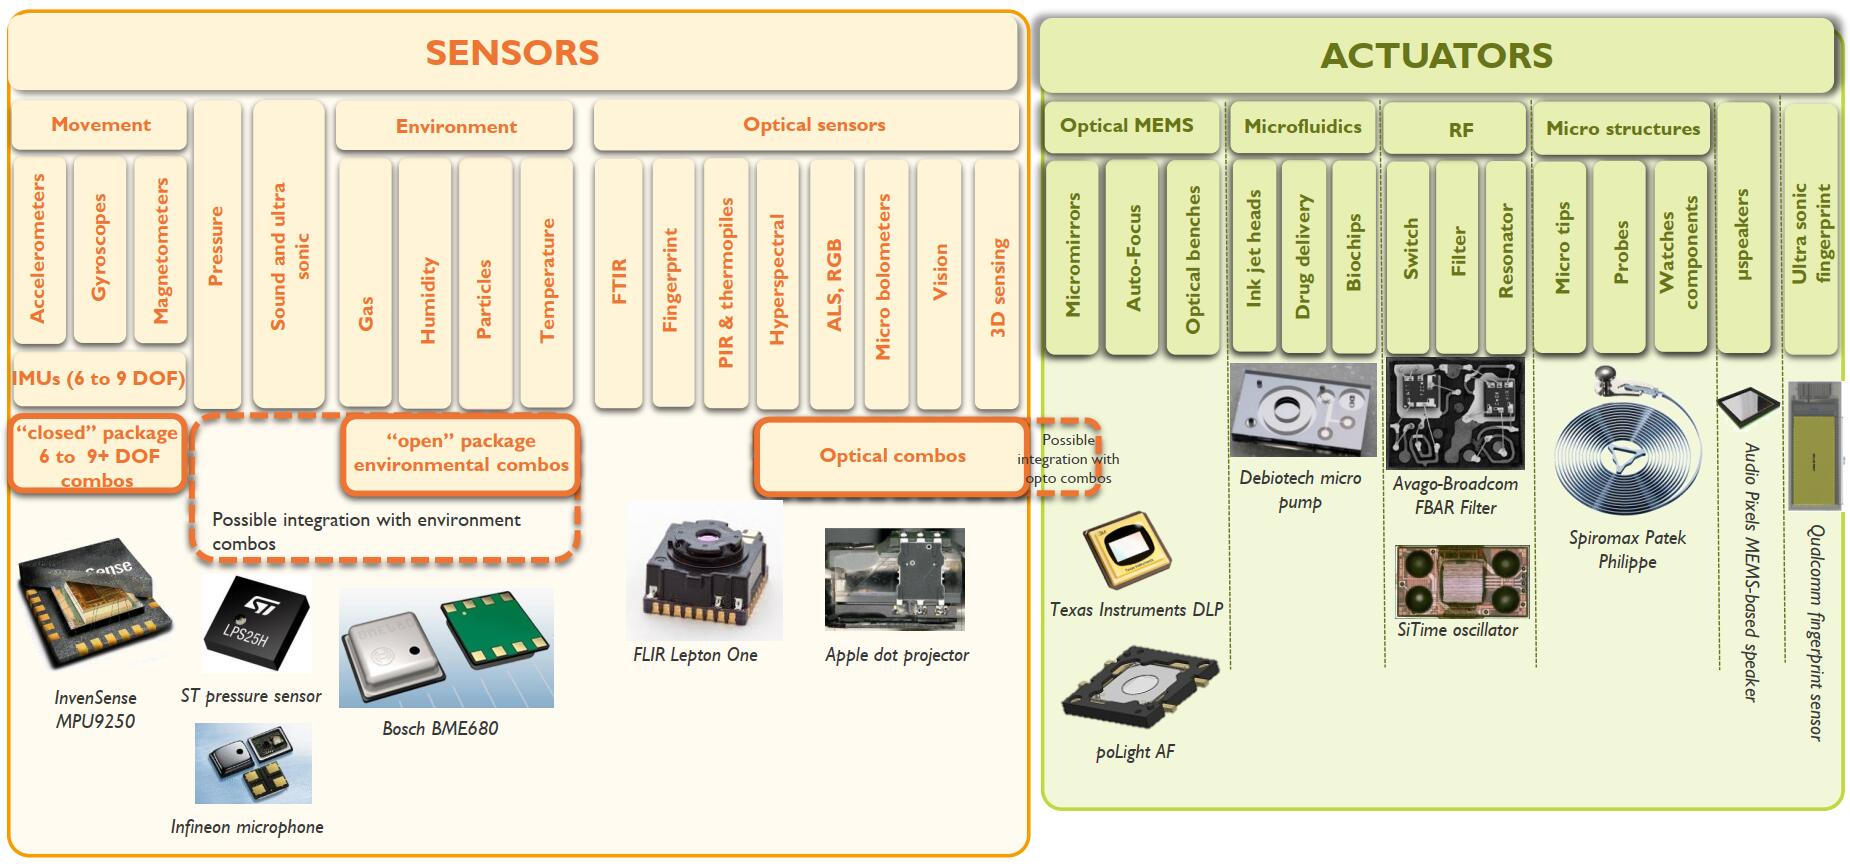 MEMS领域有三大类组合式传感器:惯性类、环境类、光学类